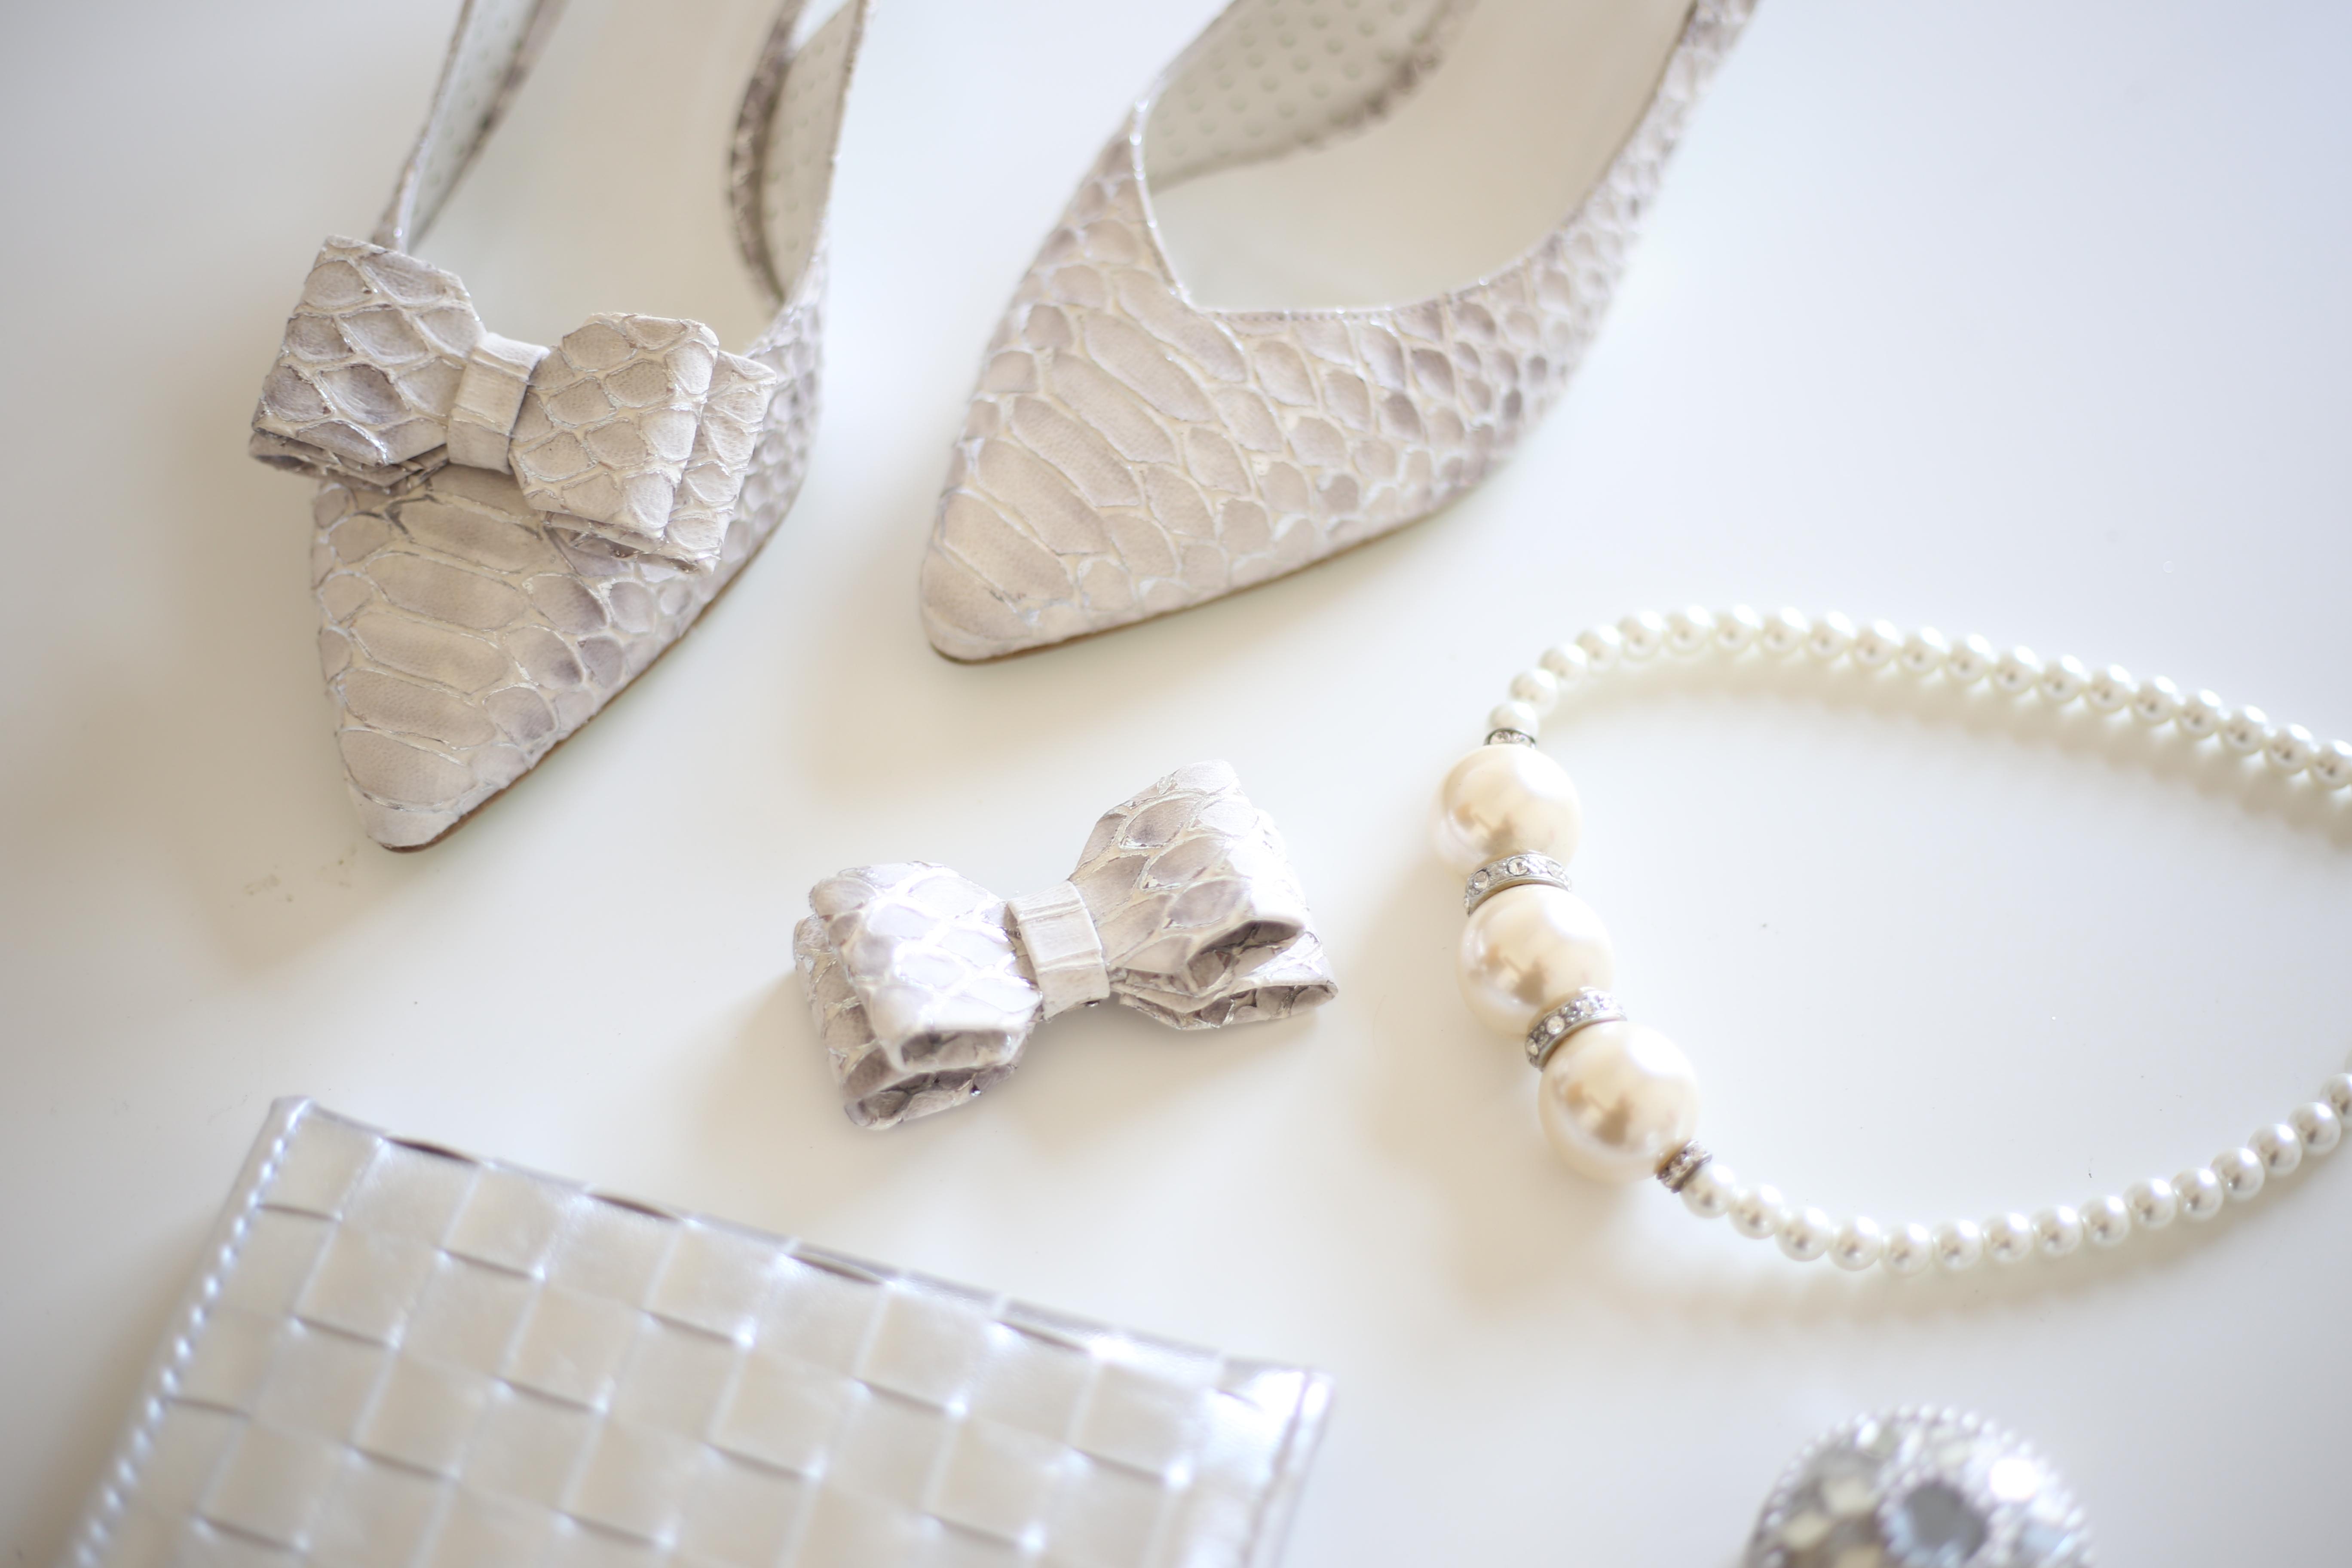 Dance 2 - Sapatos de noiva personalizados